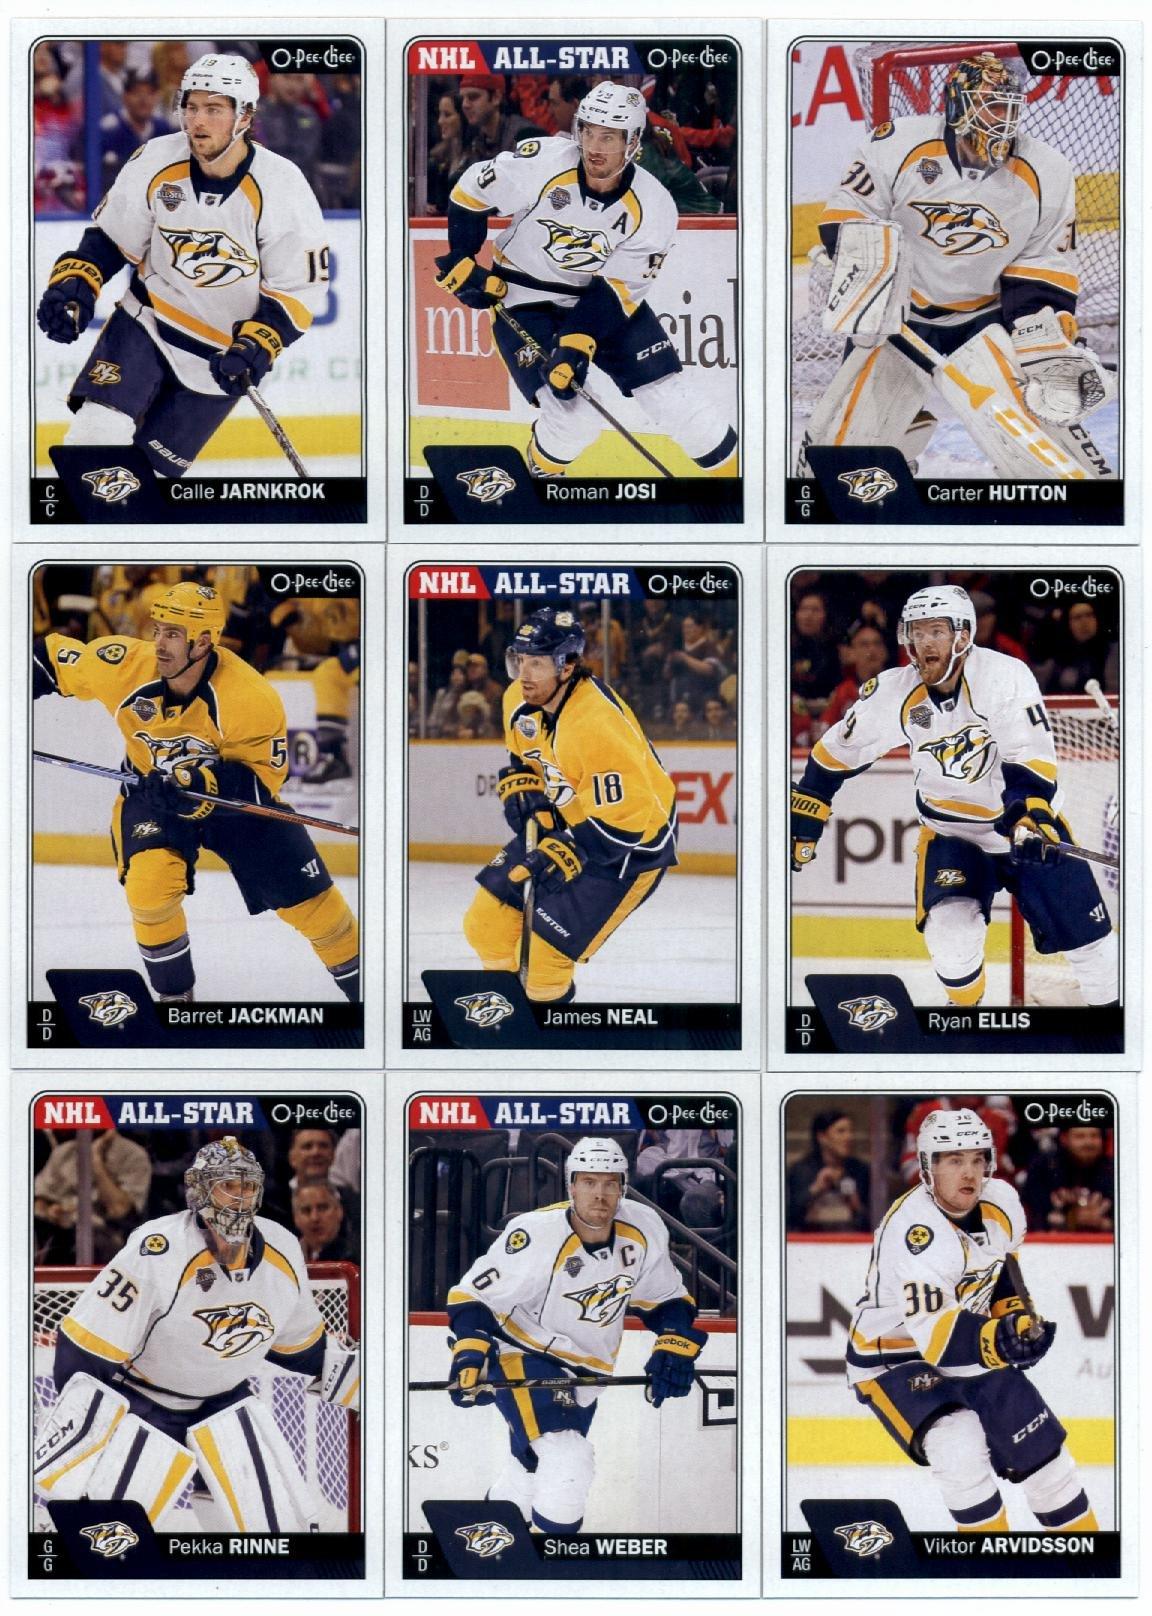 2016-17 O-Pee-Chee Hockey Nashville Predators Team Set of 18 Cards in Protective Snap Case: Roman Josi(#29), Calle Jarnkrok(#43), Carter Hutton(#64), Ryan Ellis(#76), James Neal(#89), Barret Jackman(#137), Viktor Arvidsson(#214), Shea Weber(#230), Pekka Rinne(#253), Filip Forsberg(#266), Paul